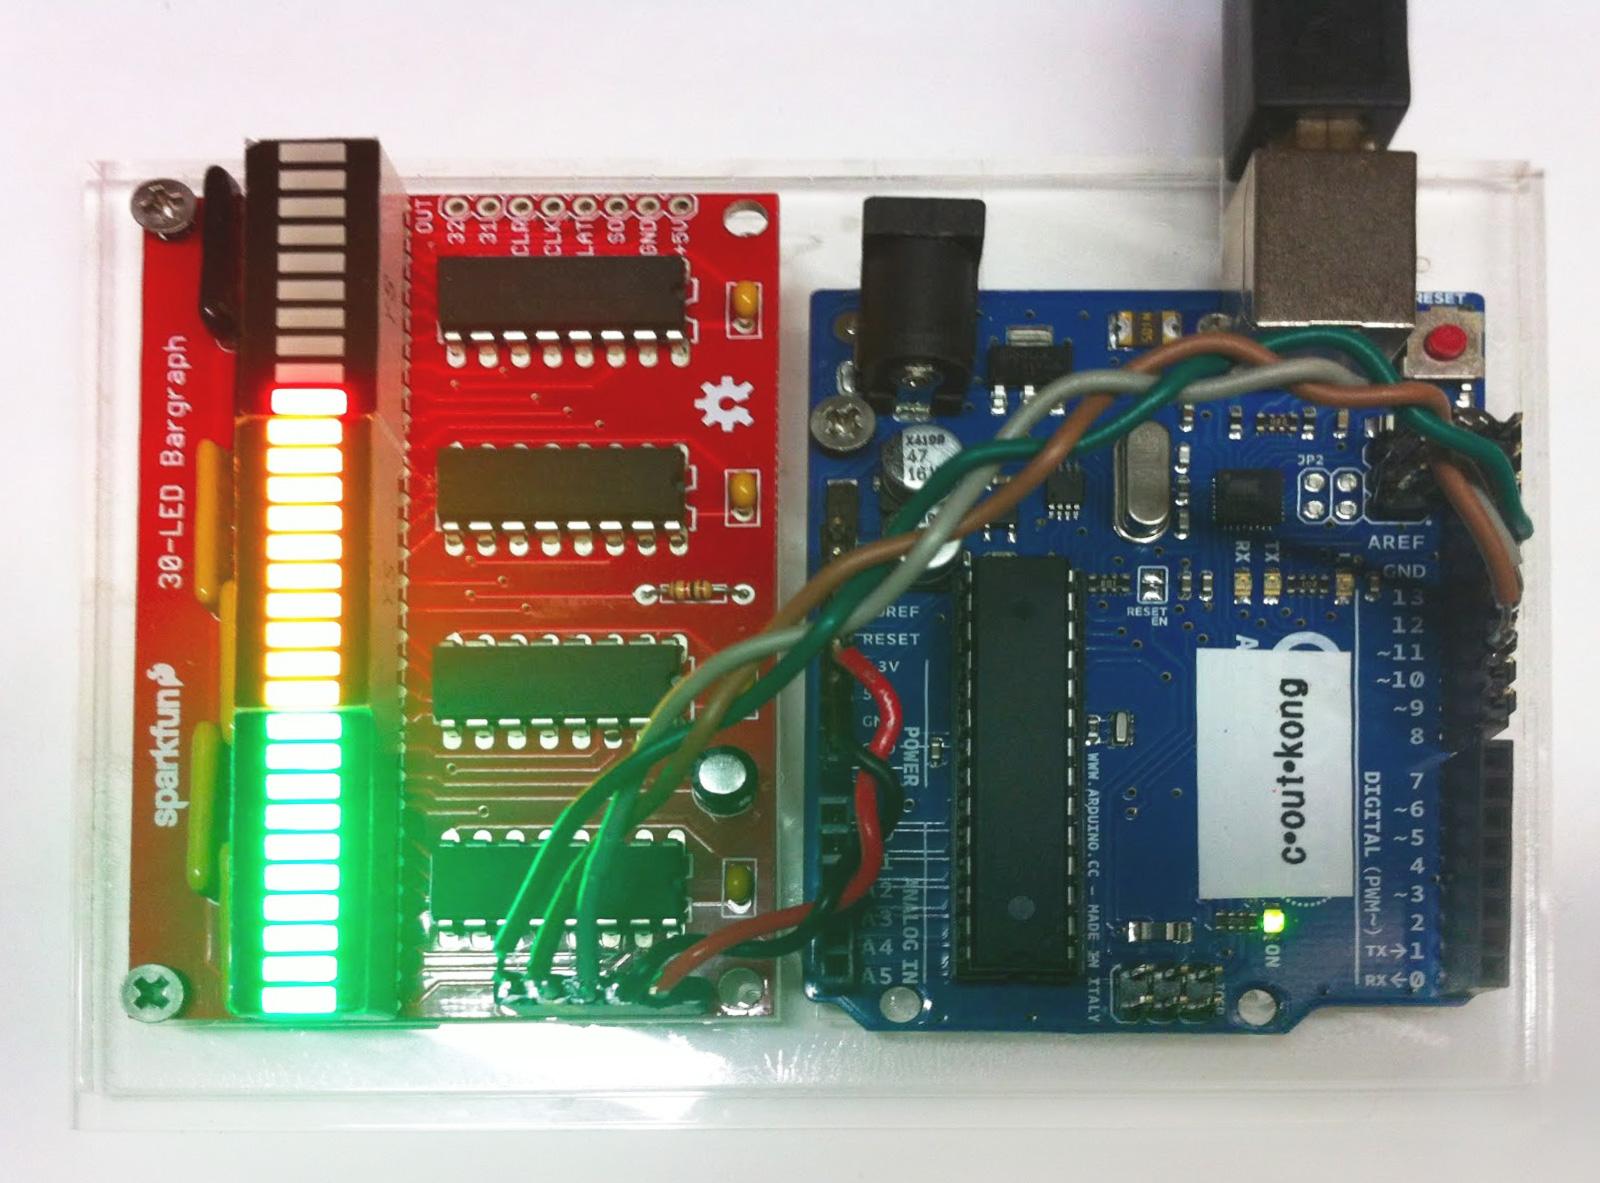 LED Bar Graph responding to javascript slider input via Spacebrew.